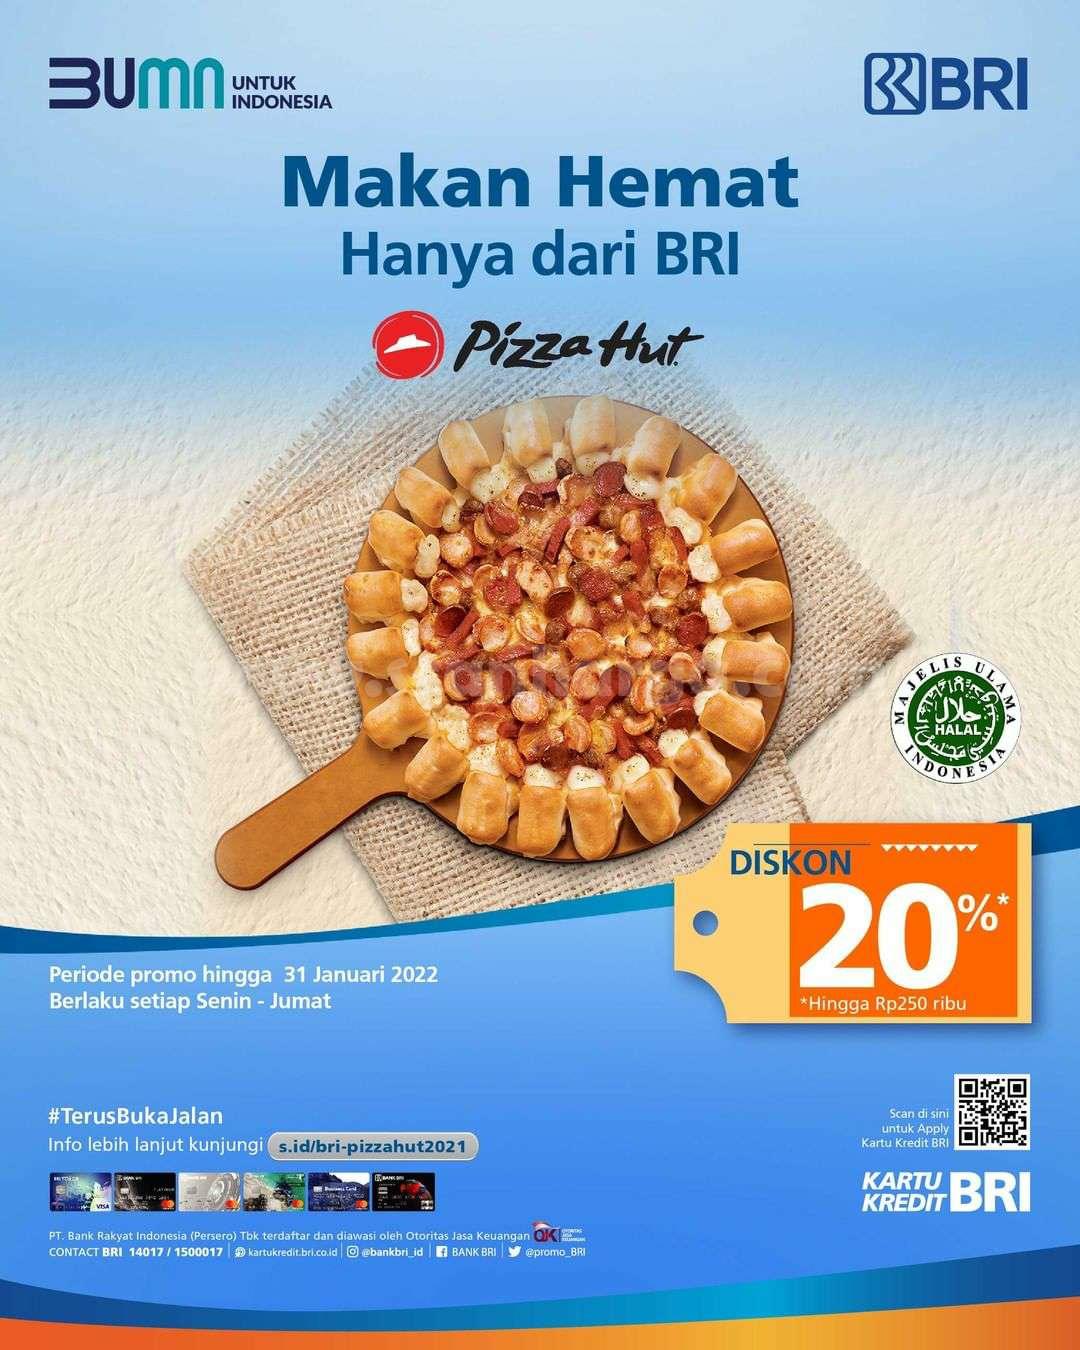 PIZZA HUT Promo Diskon hingga 20% dengan Kartu Kredit BRI